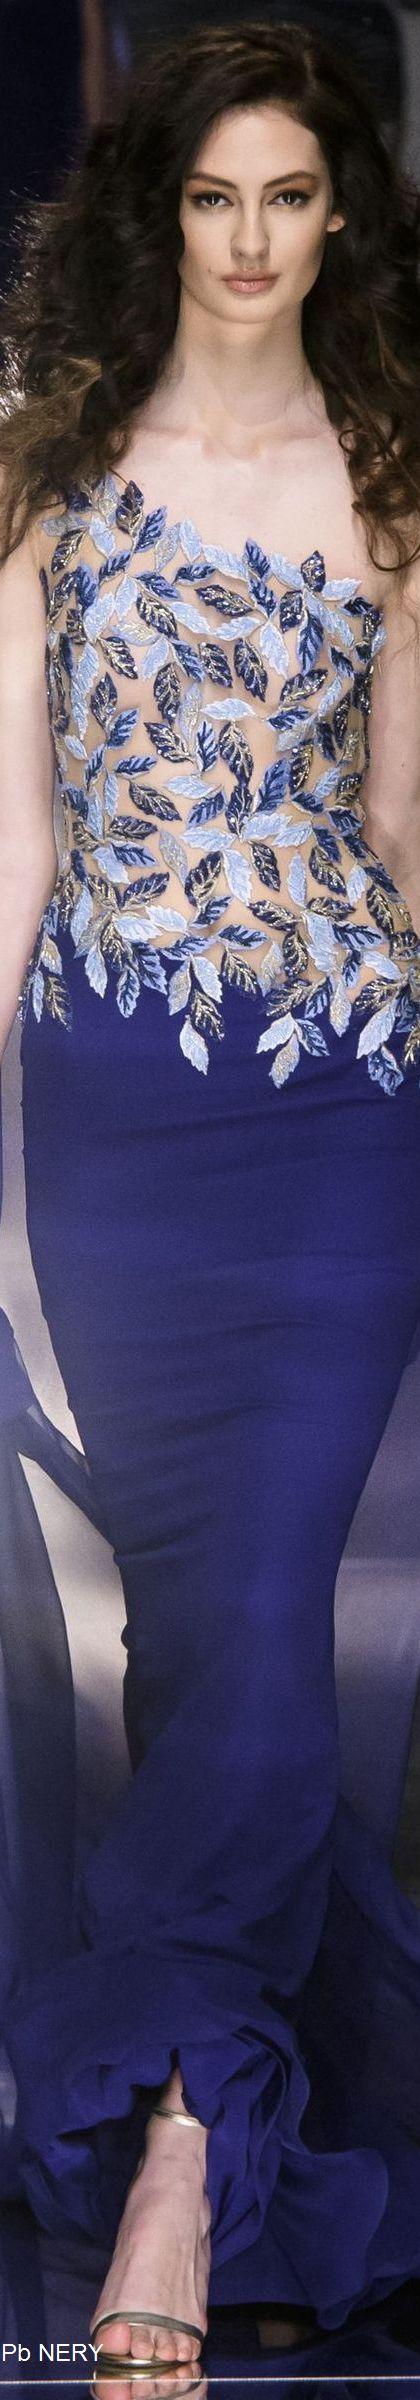 Rani zakhem spring couture vestido coctel pinterest